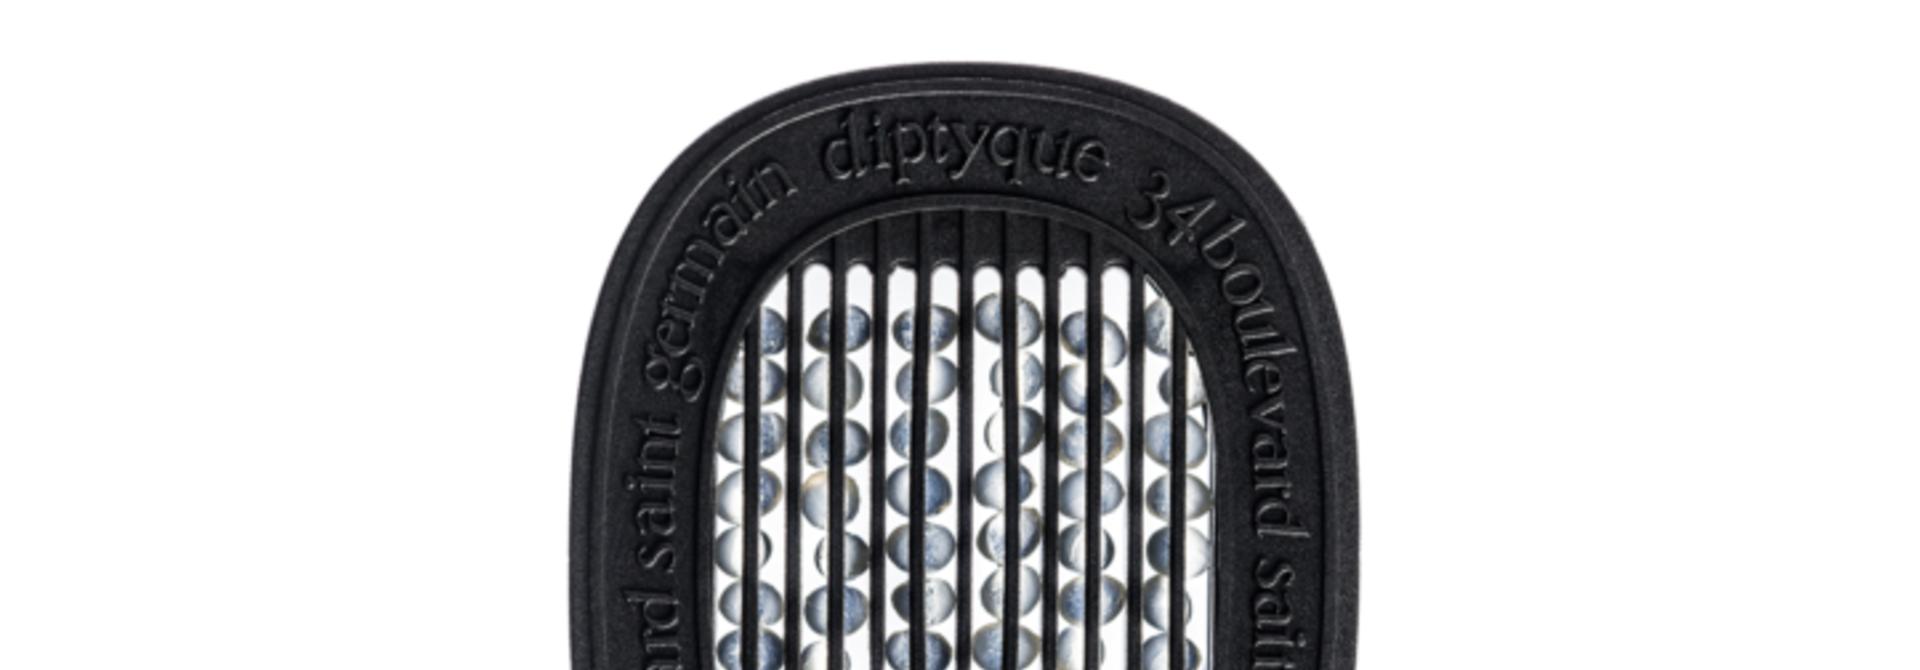 DIPTYQUE - Amber Diffuser Capsule Refill